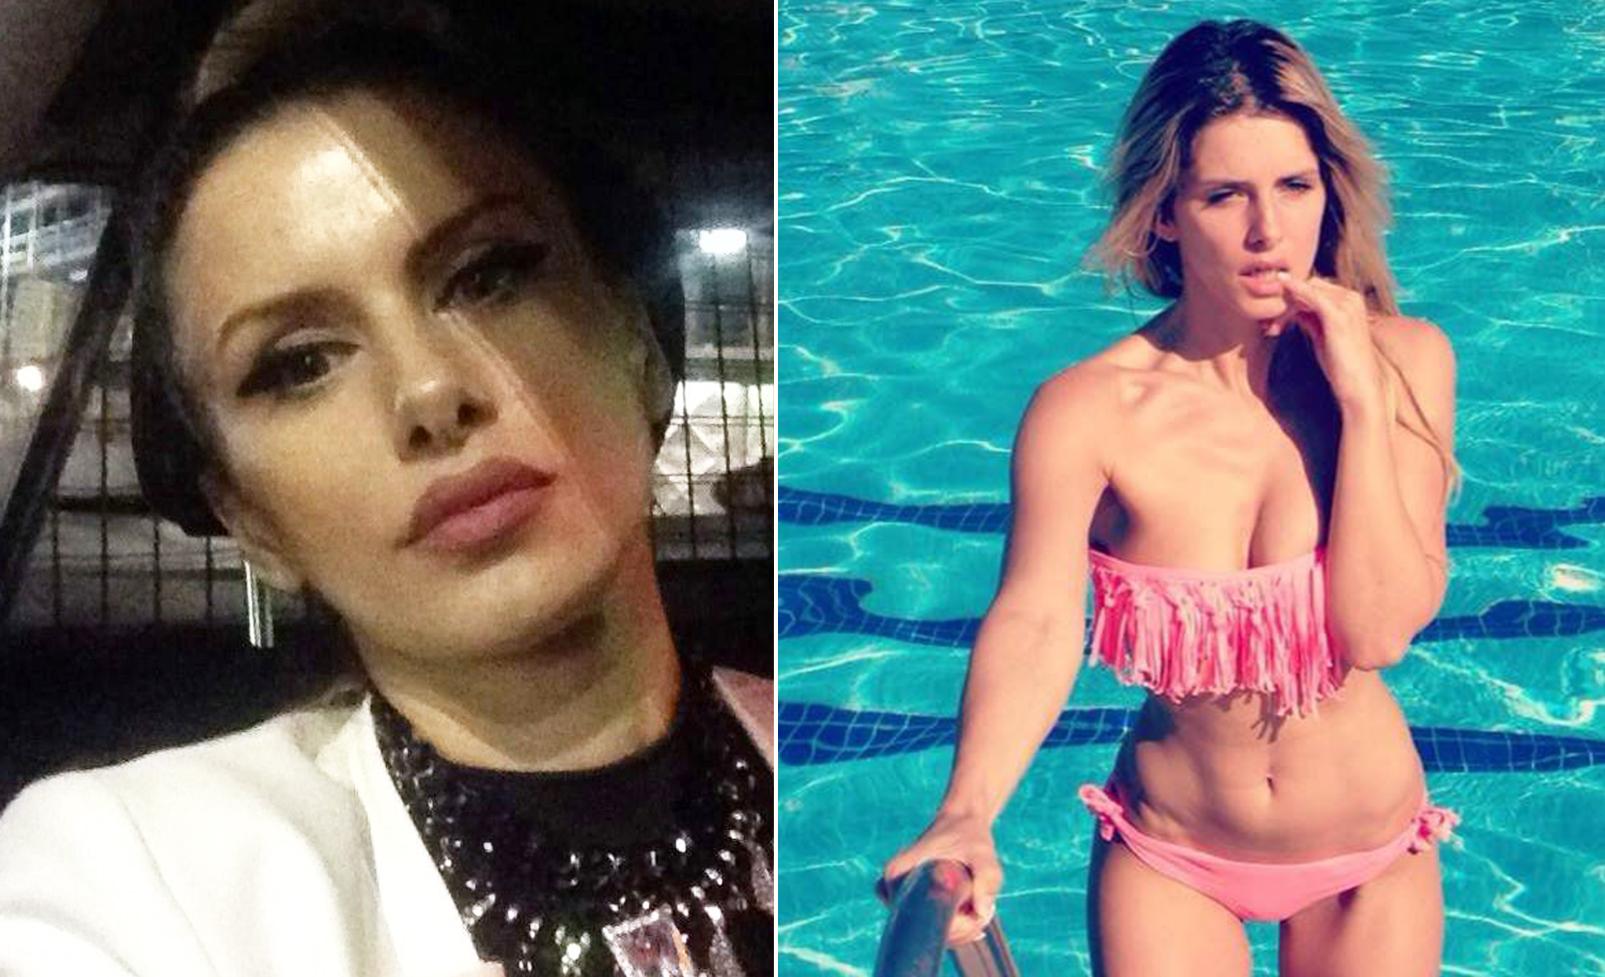 Playboy model jailed for trying to kill mafia boss